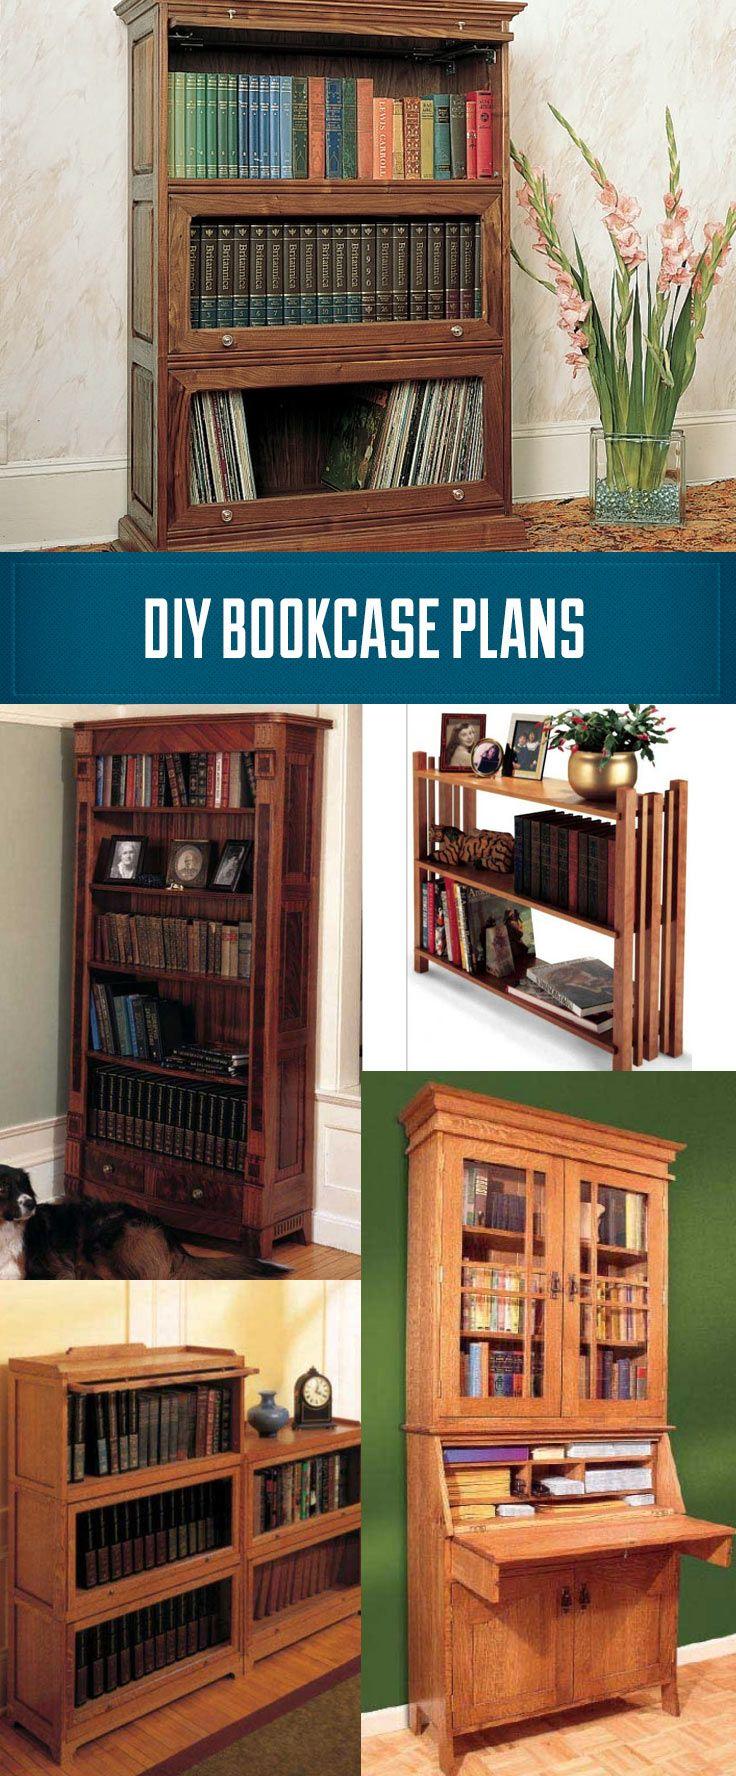 best 25 bookcase plans ideas on pinterest build a bookcase build a bookshelf and diy. Black Bedroom Furniture Sets. Home Design Ideas